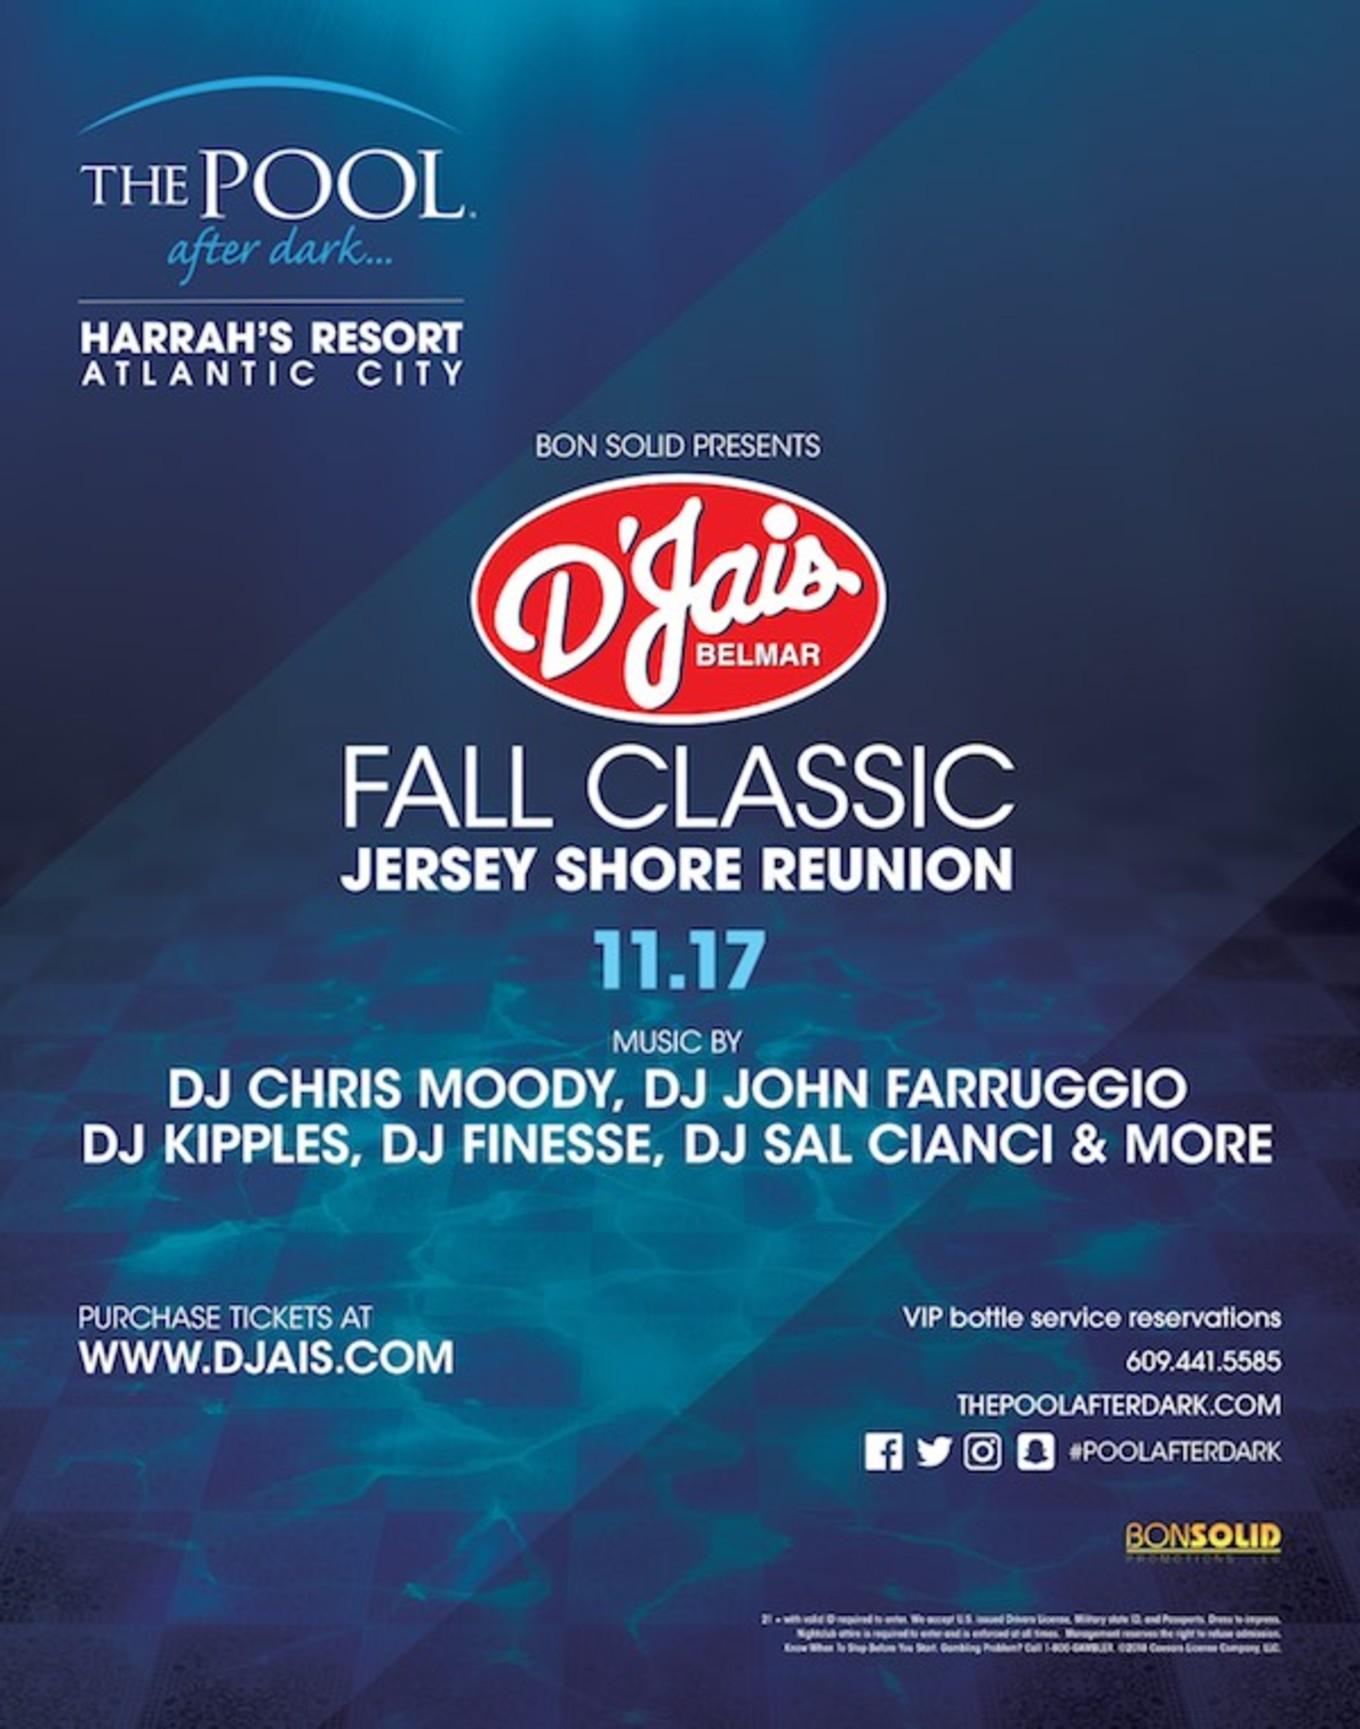 D'Jais Belmar Fall Classic - The Pool After Dark, Atlantic